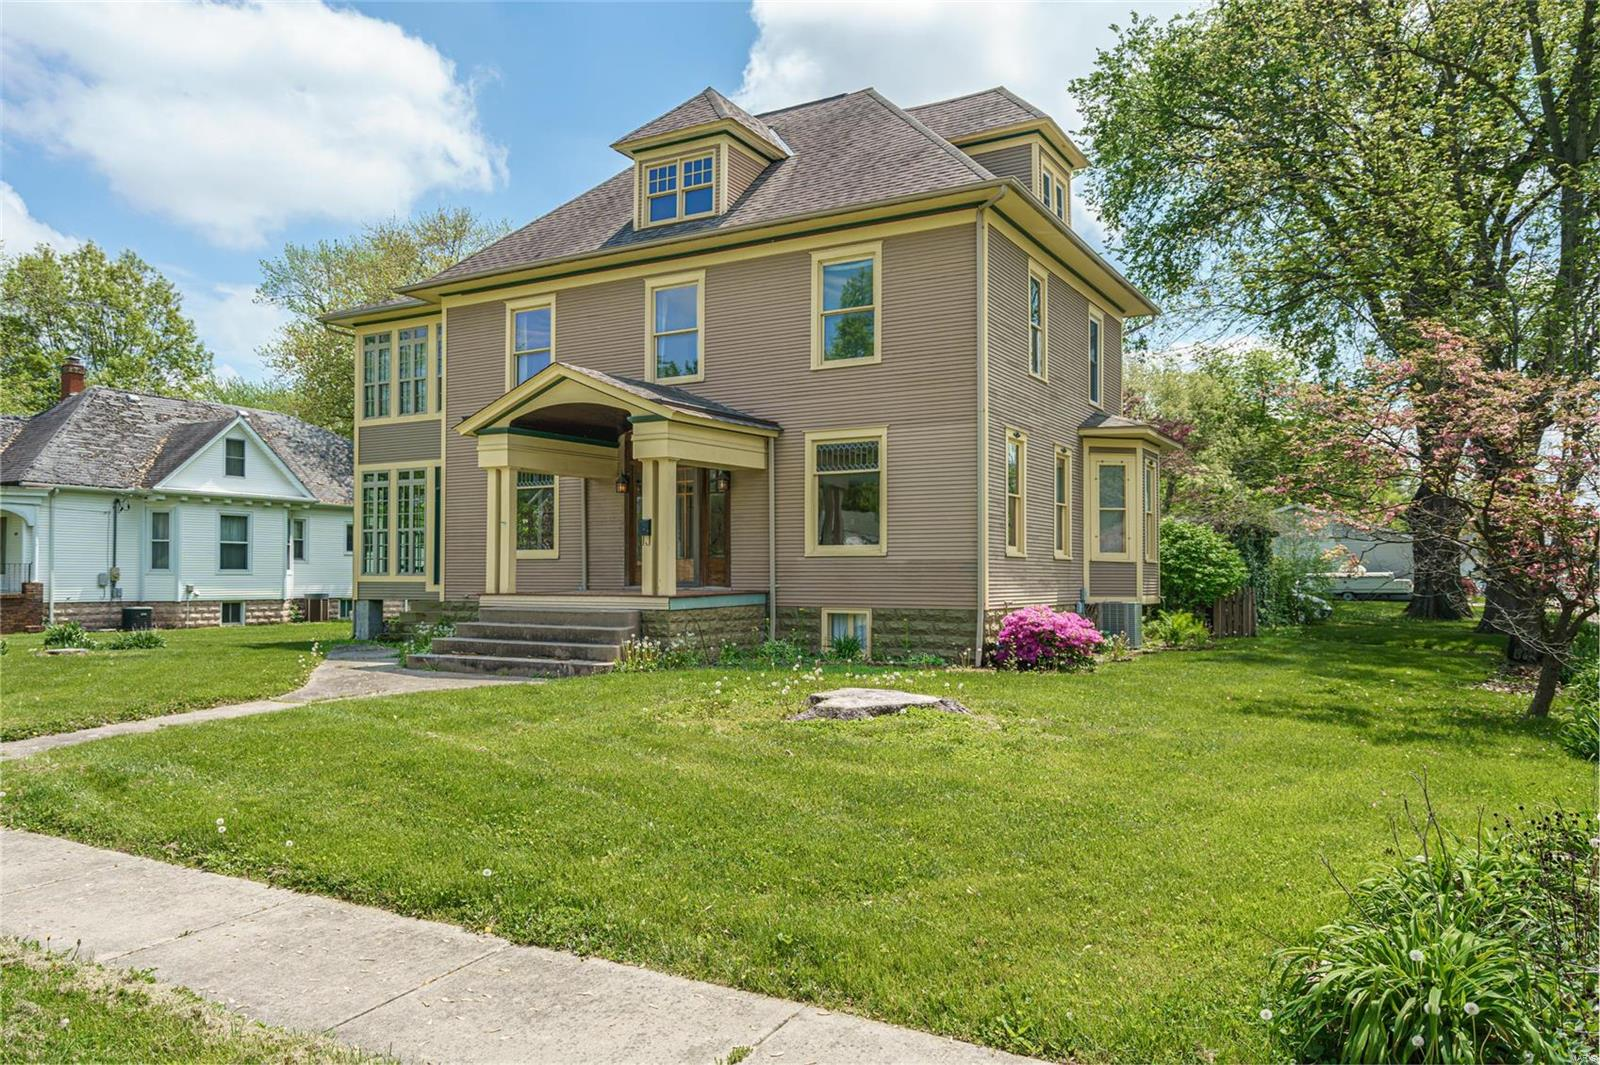 206 E Pennsylvania Property Photo - Staunton, IL real estate listing